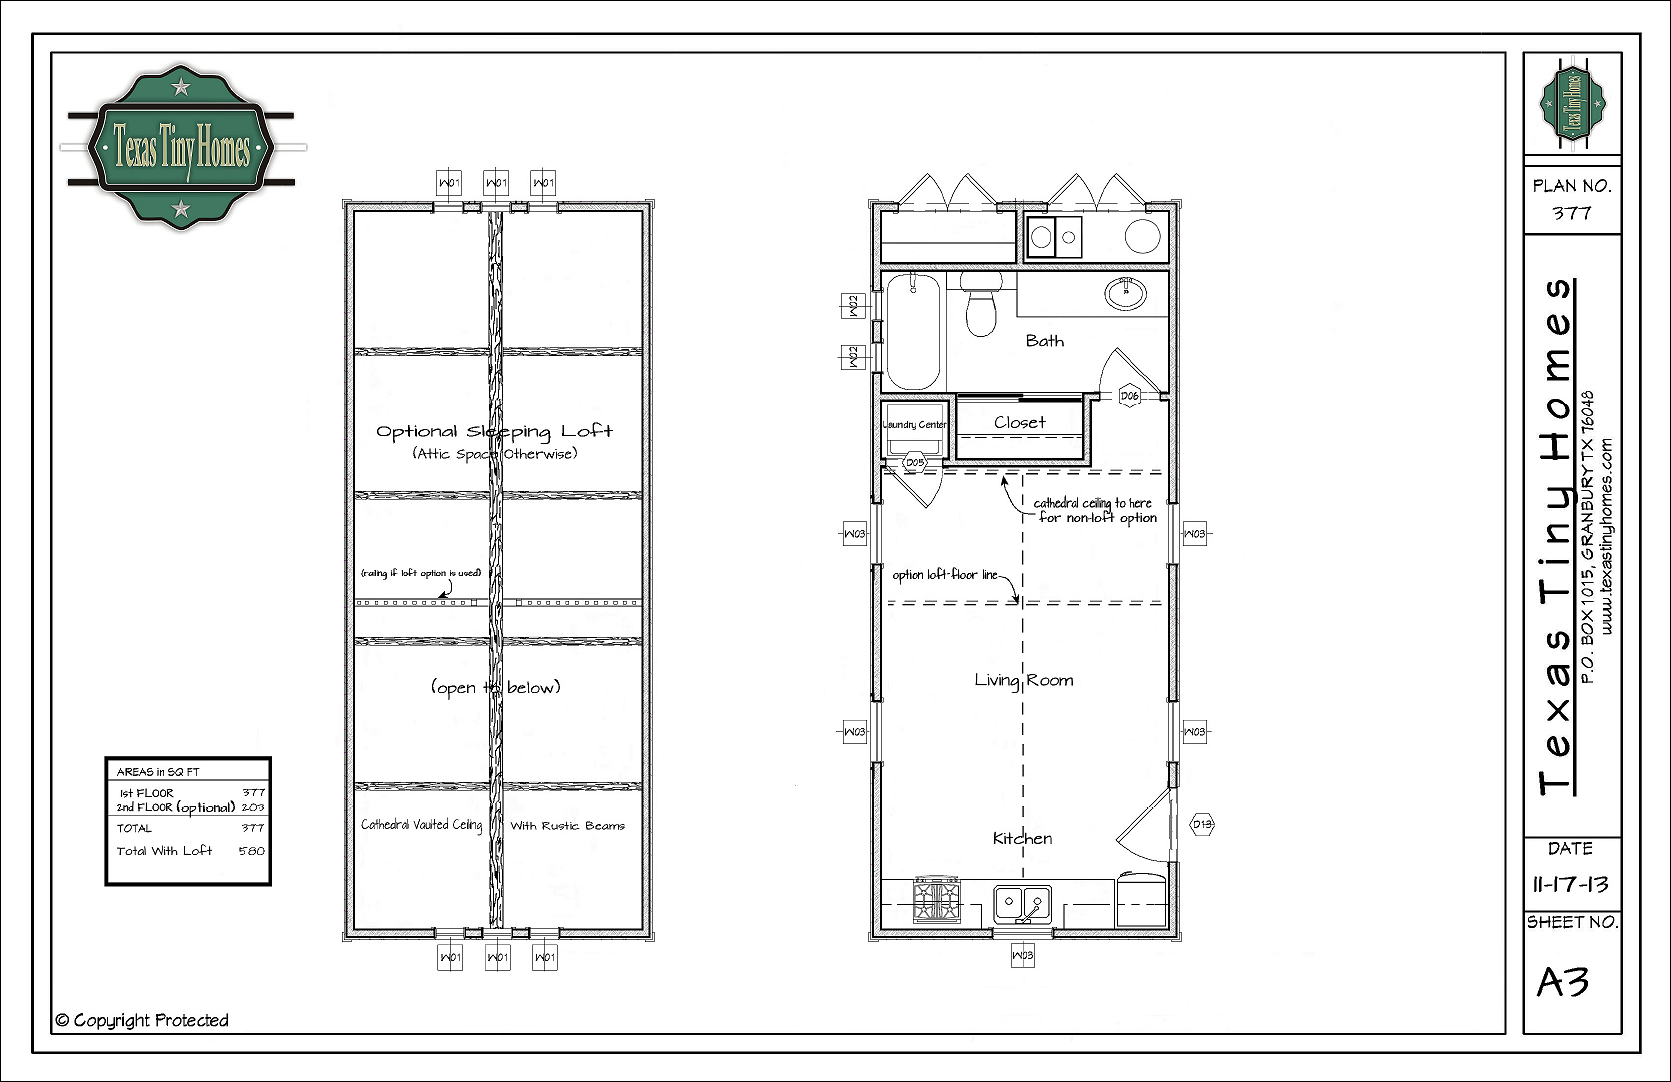 Floor Plan Presentation Sheet - For Website